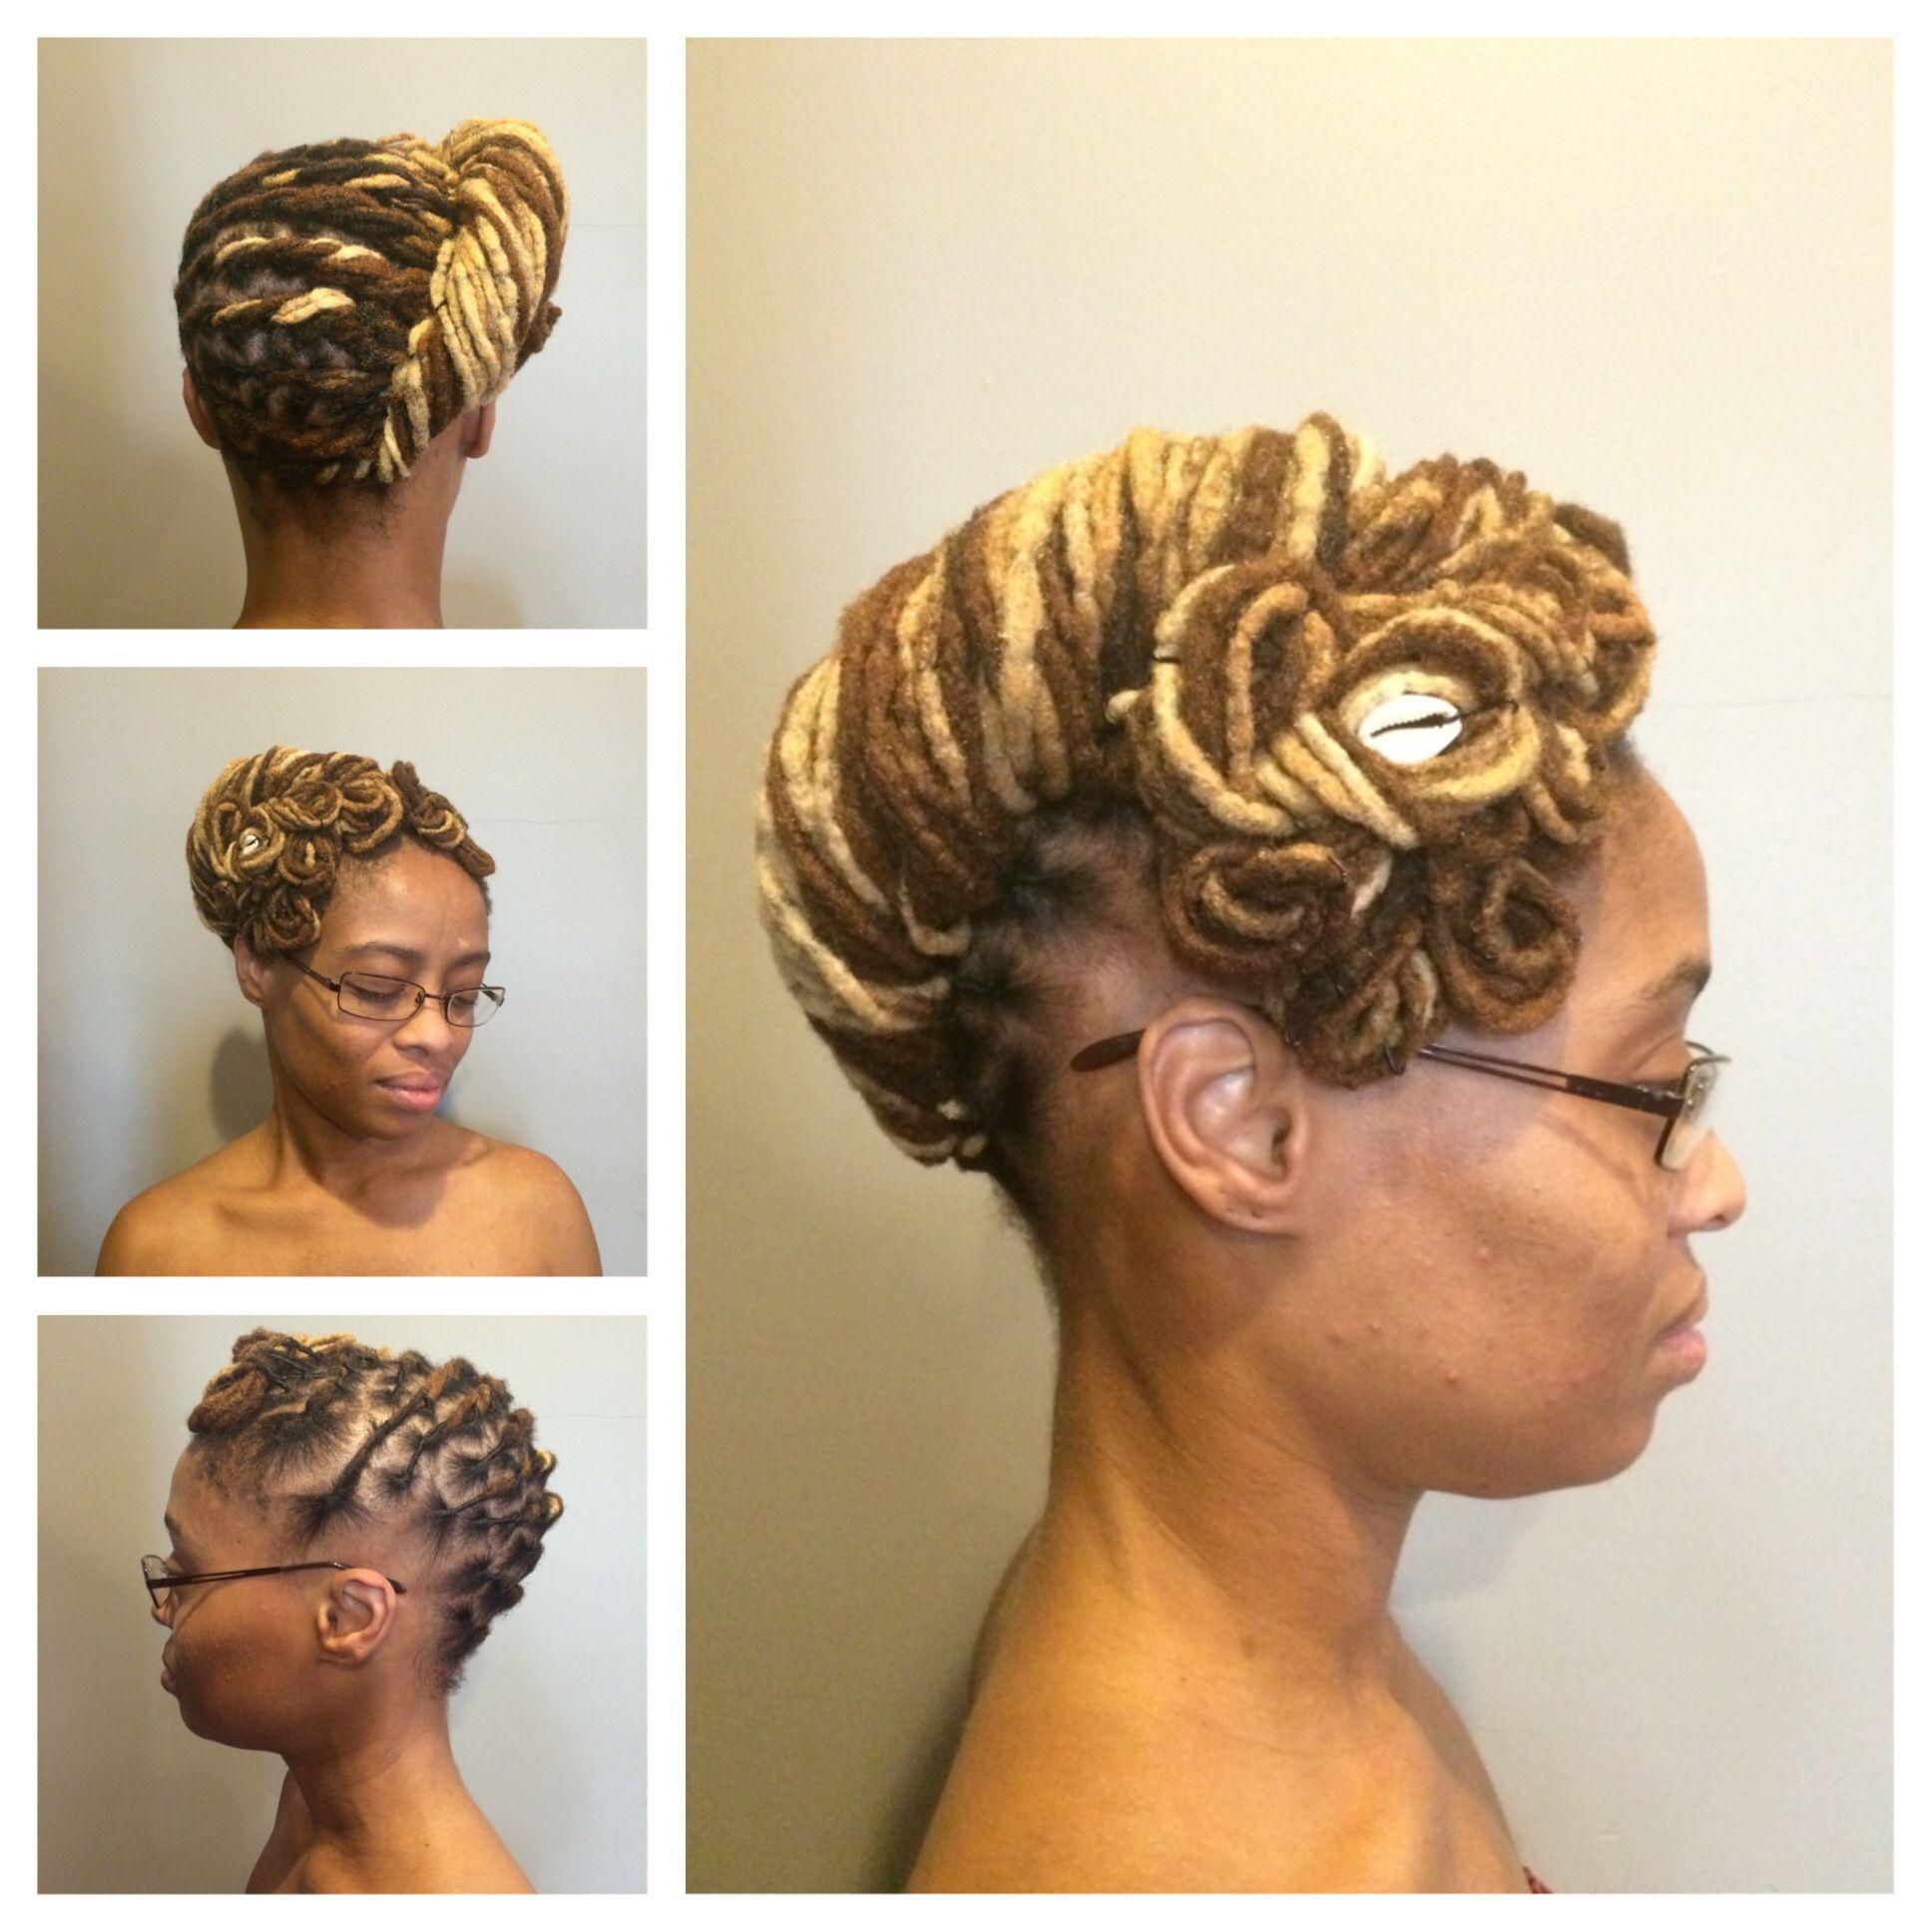 pin-ups | dread-locs in 2019 | natural hair styles, hair